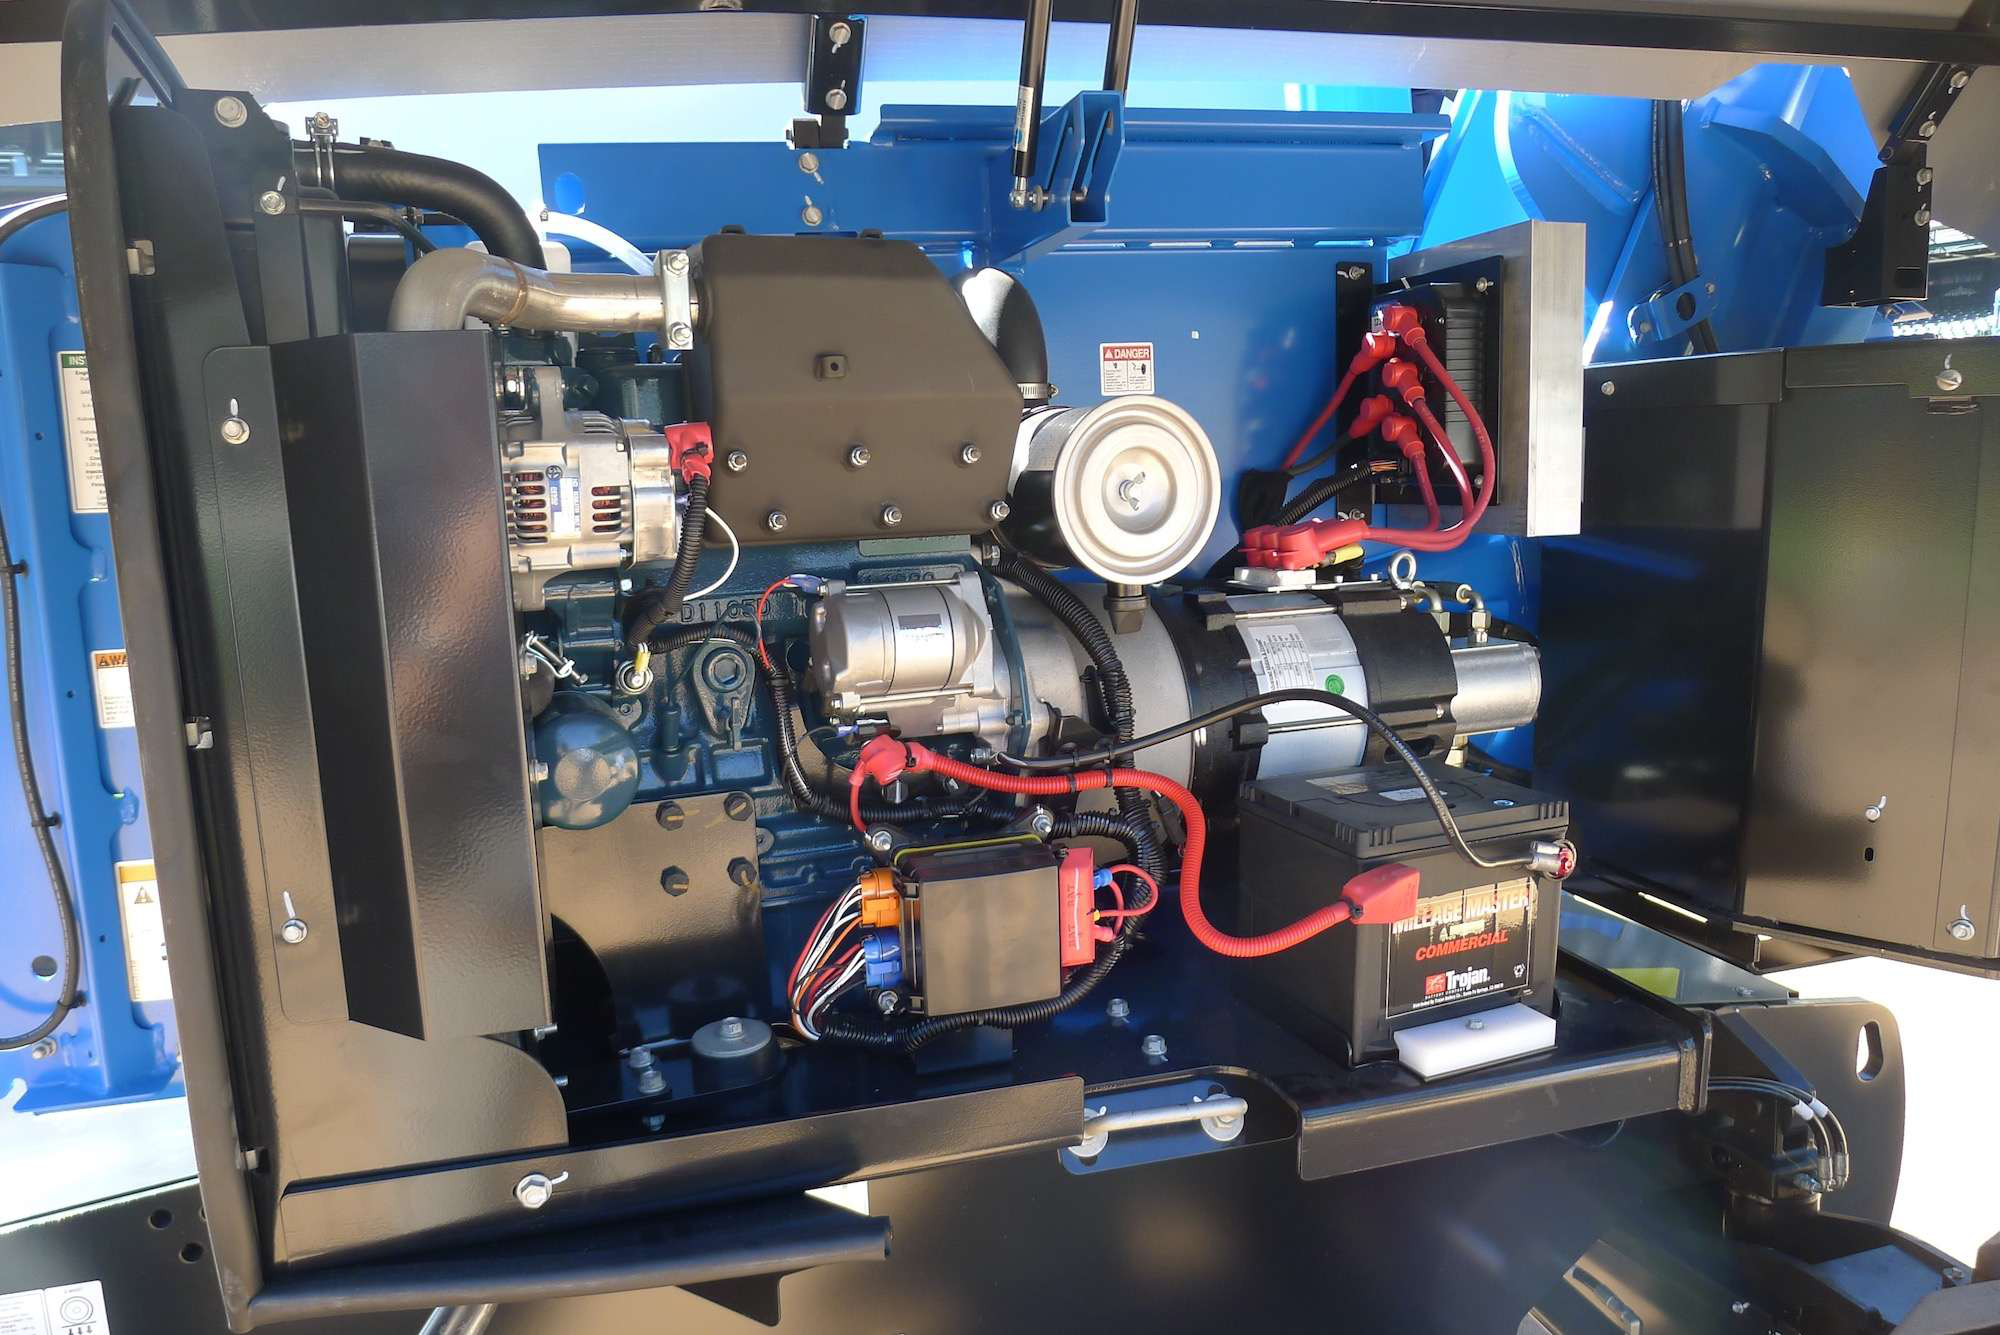 Genie 39 S Z 60 37 Fe Diesel Electric Boom Lift Offers Hybrid